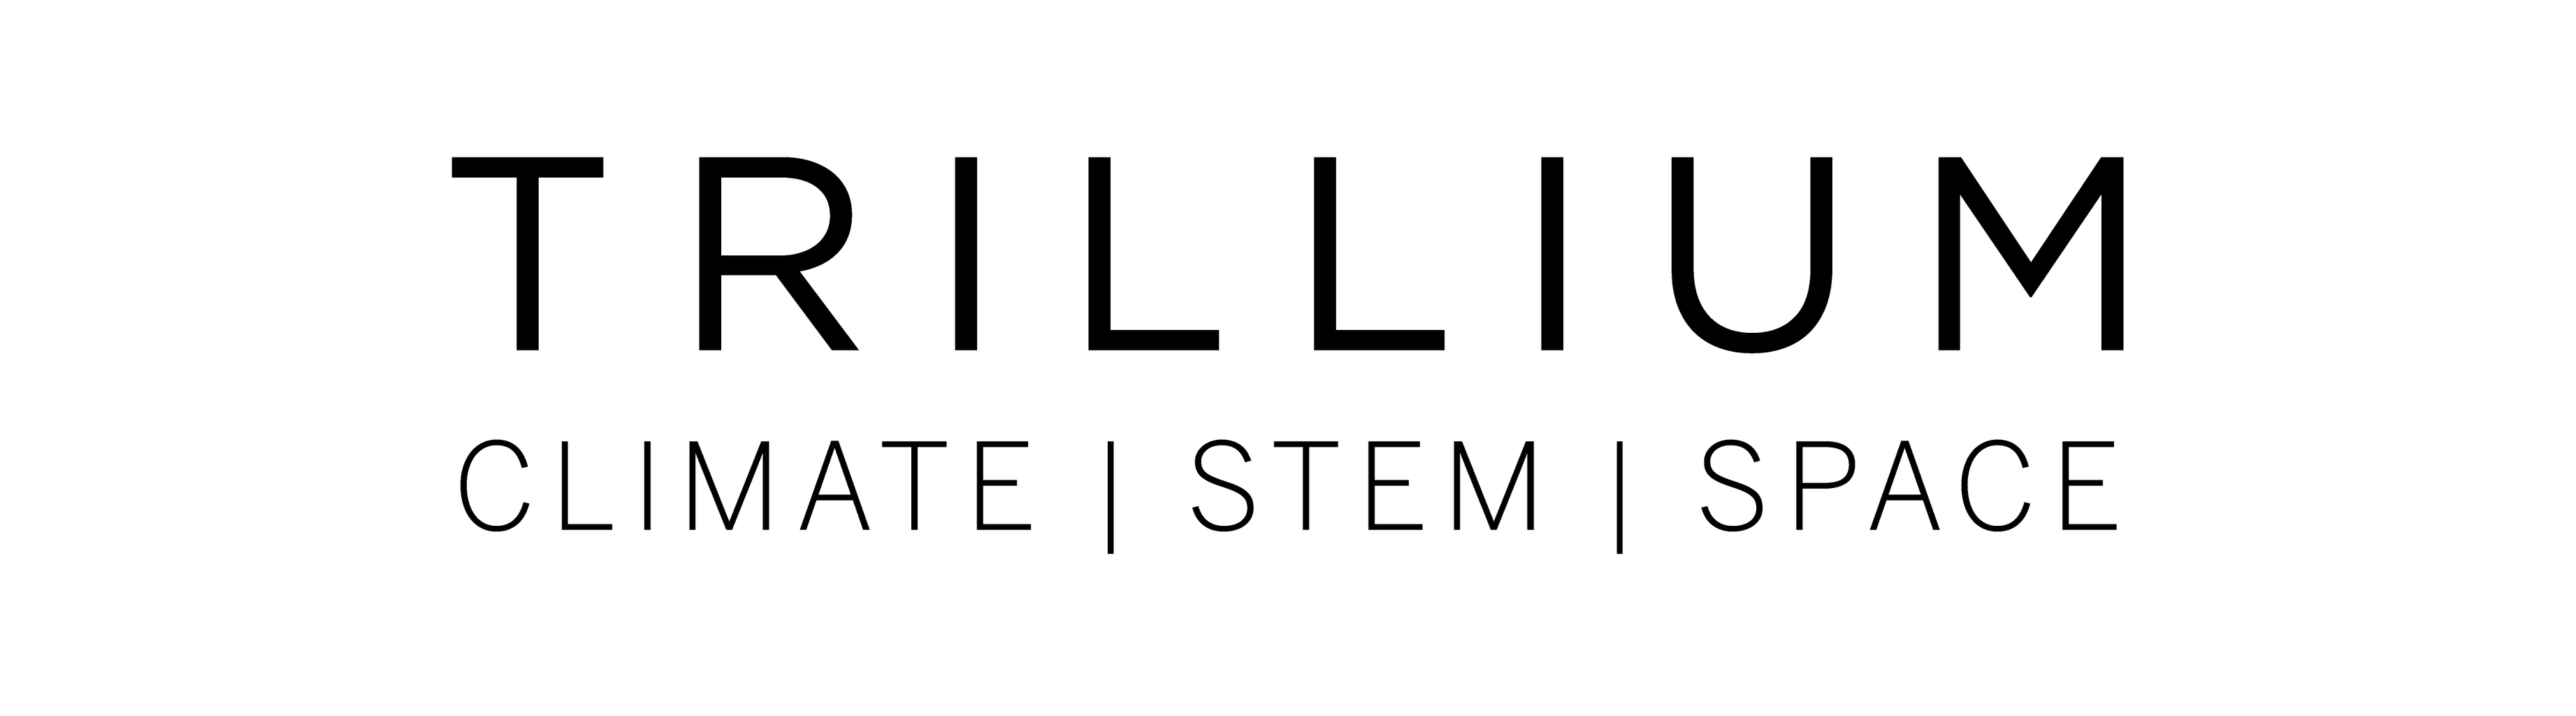 Stipple on Sole (Optional)